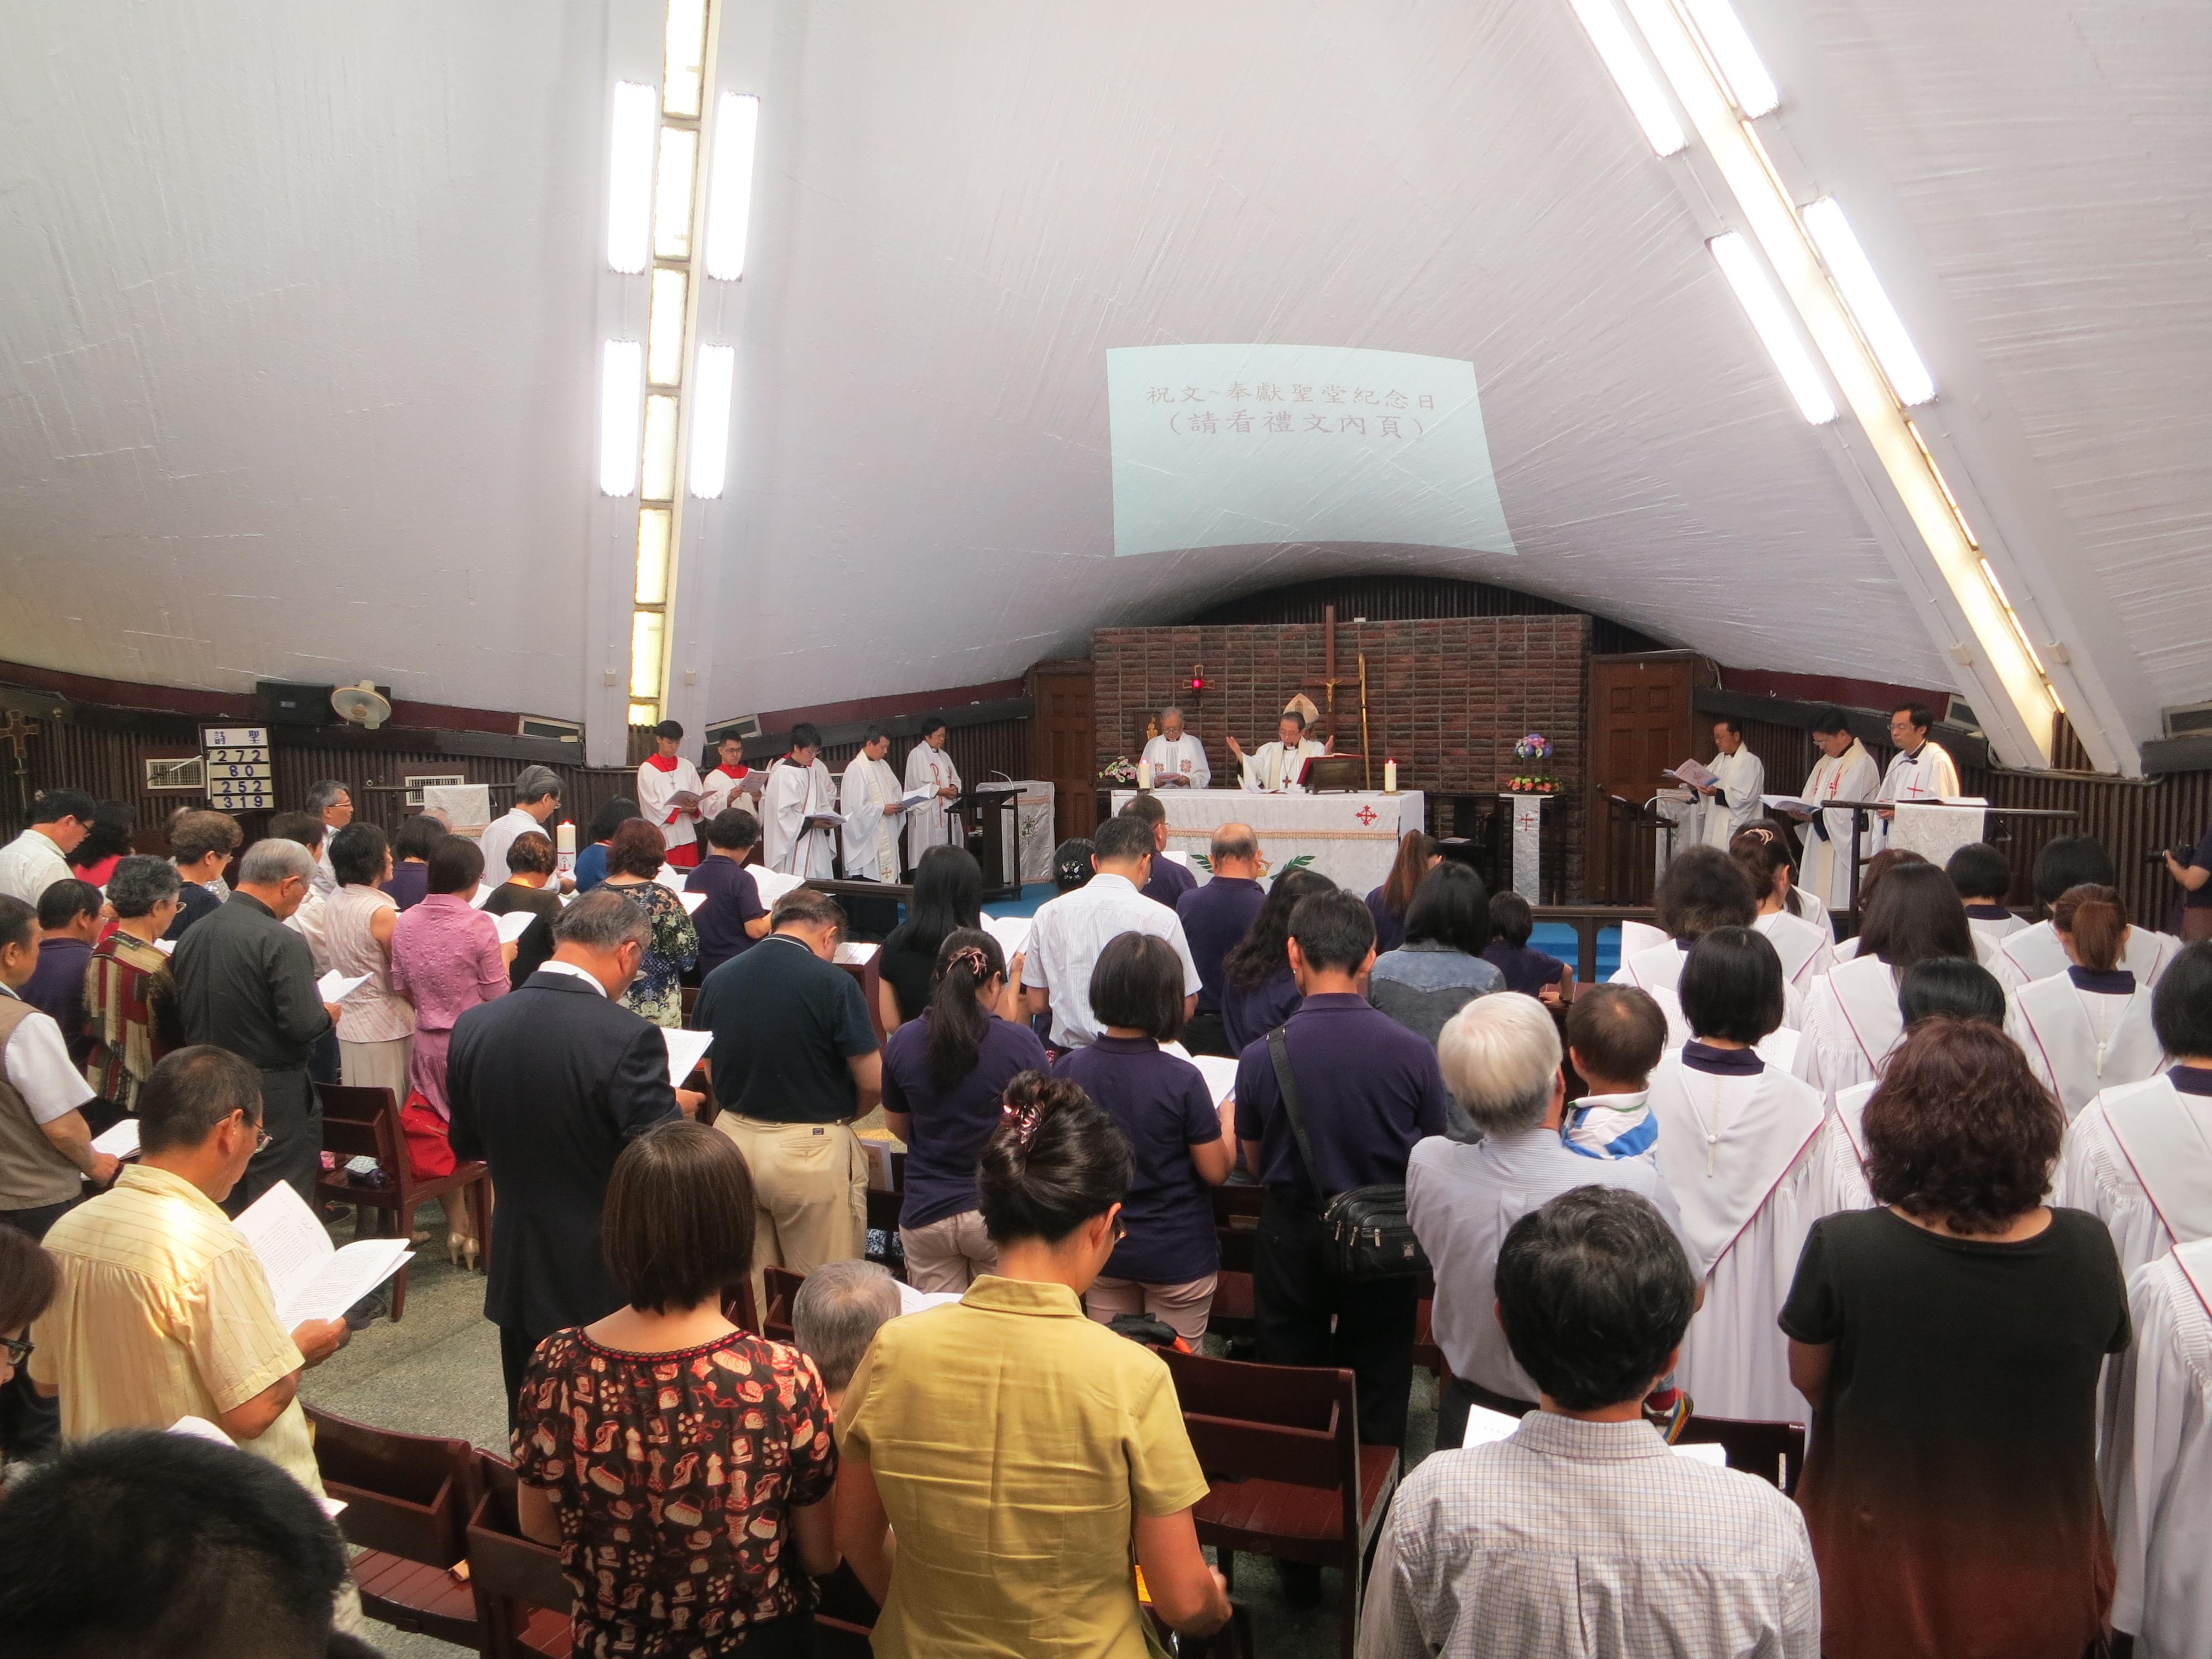 高雄聖保羅堂60週年感恩禮拜 St. Paul's Church, Kaohsiung celebrates 60 years!   Catherine Lee